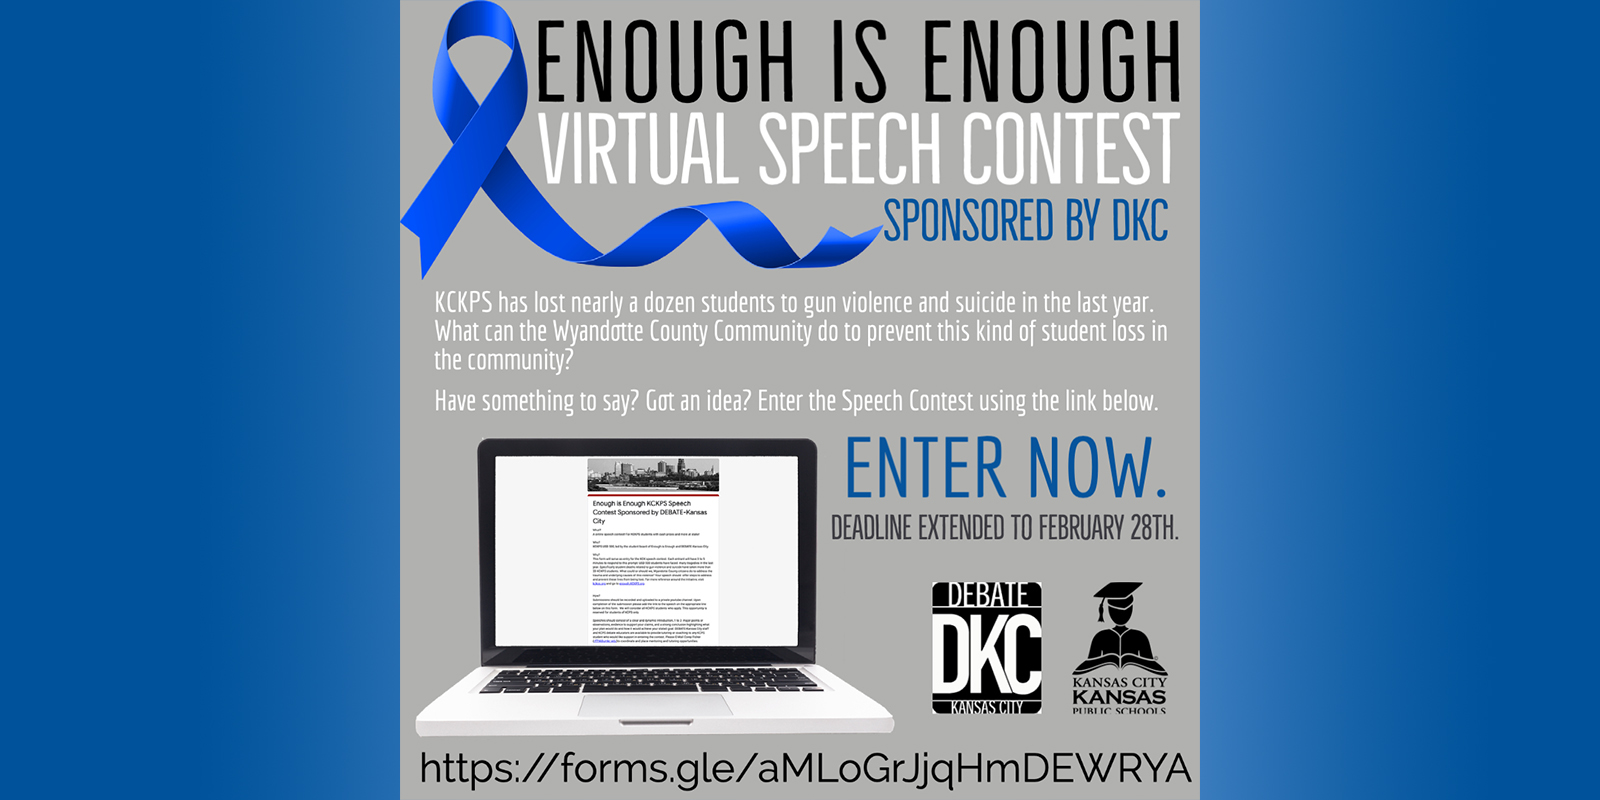 Enough is Enough Speech Contest